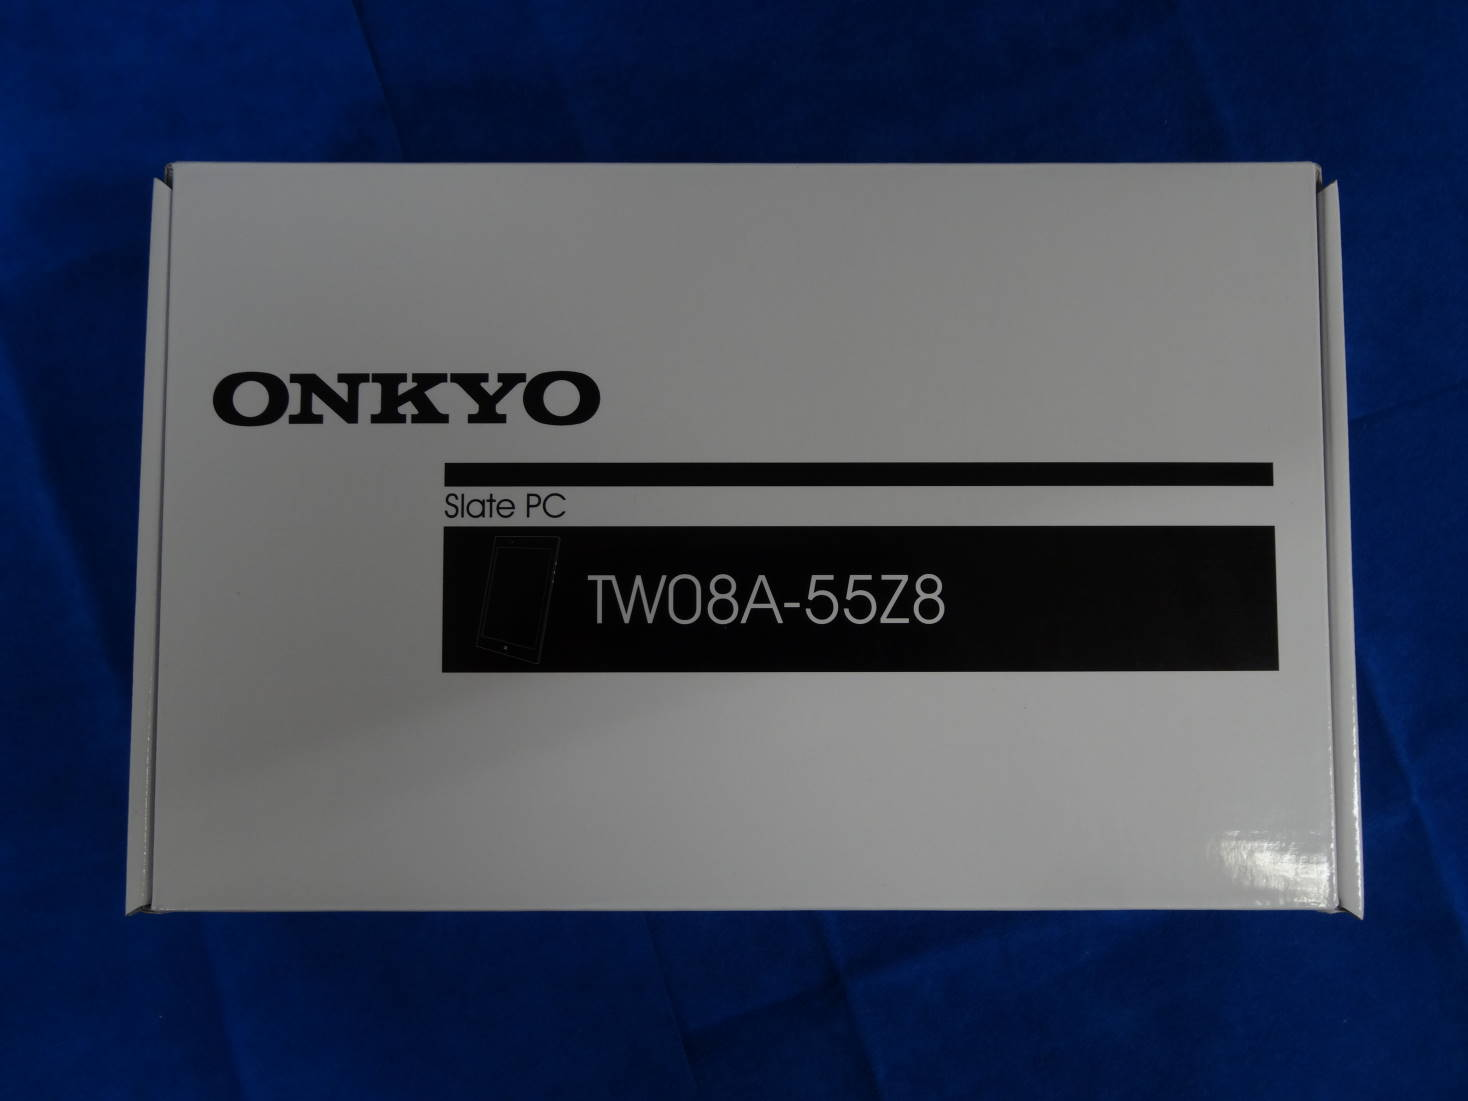 ONKYO Slate PC TW08A-55Z8 外箱